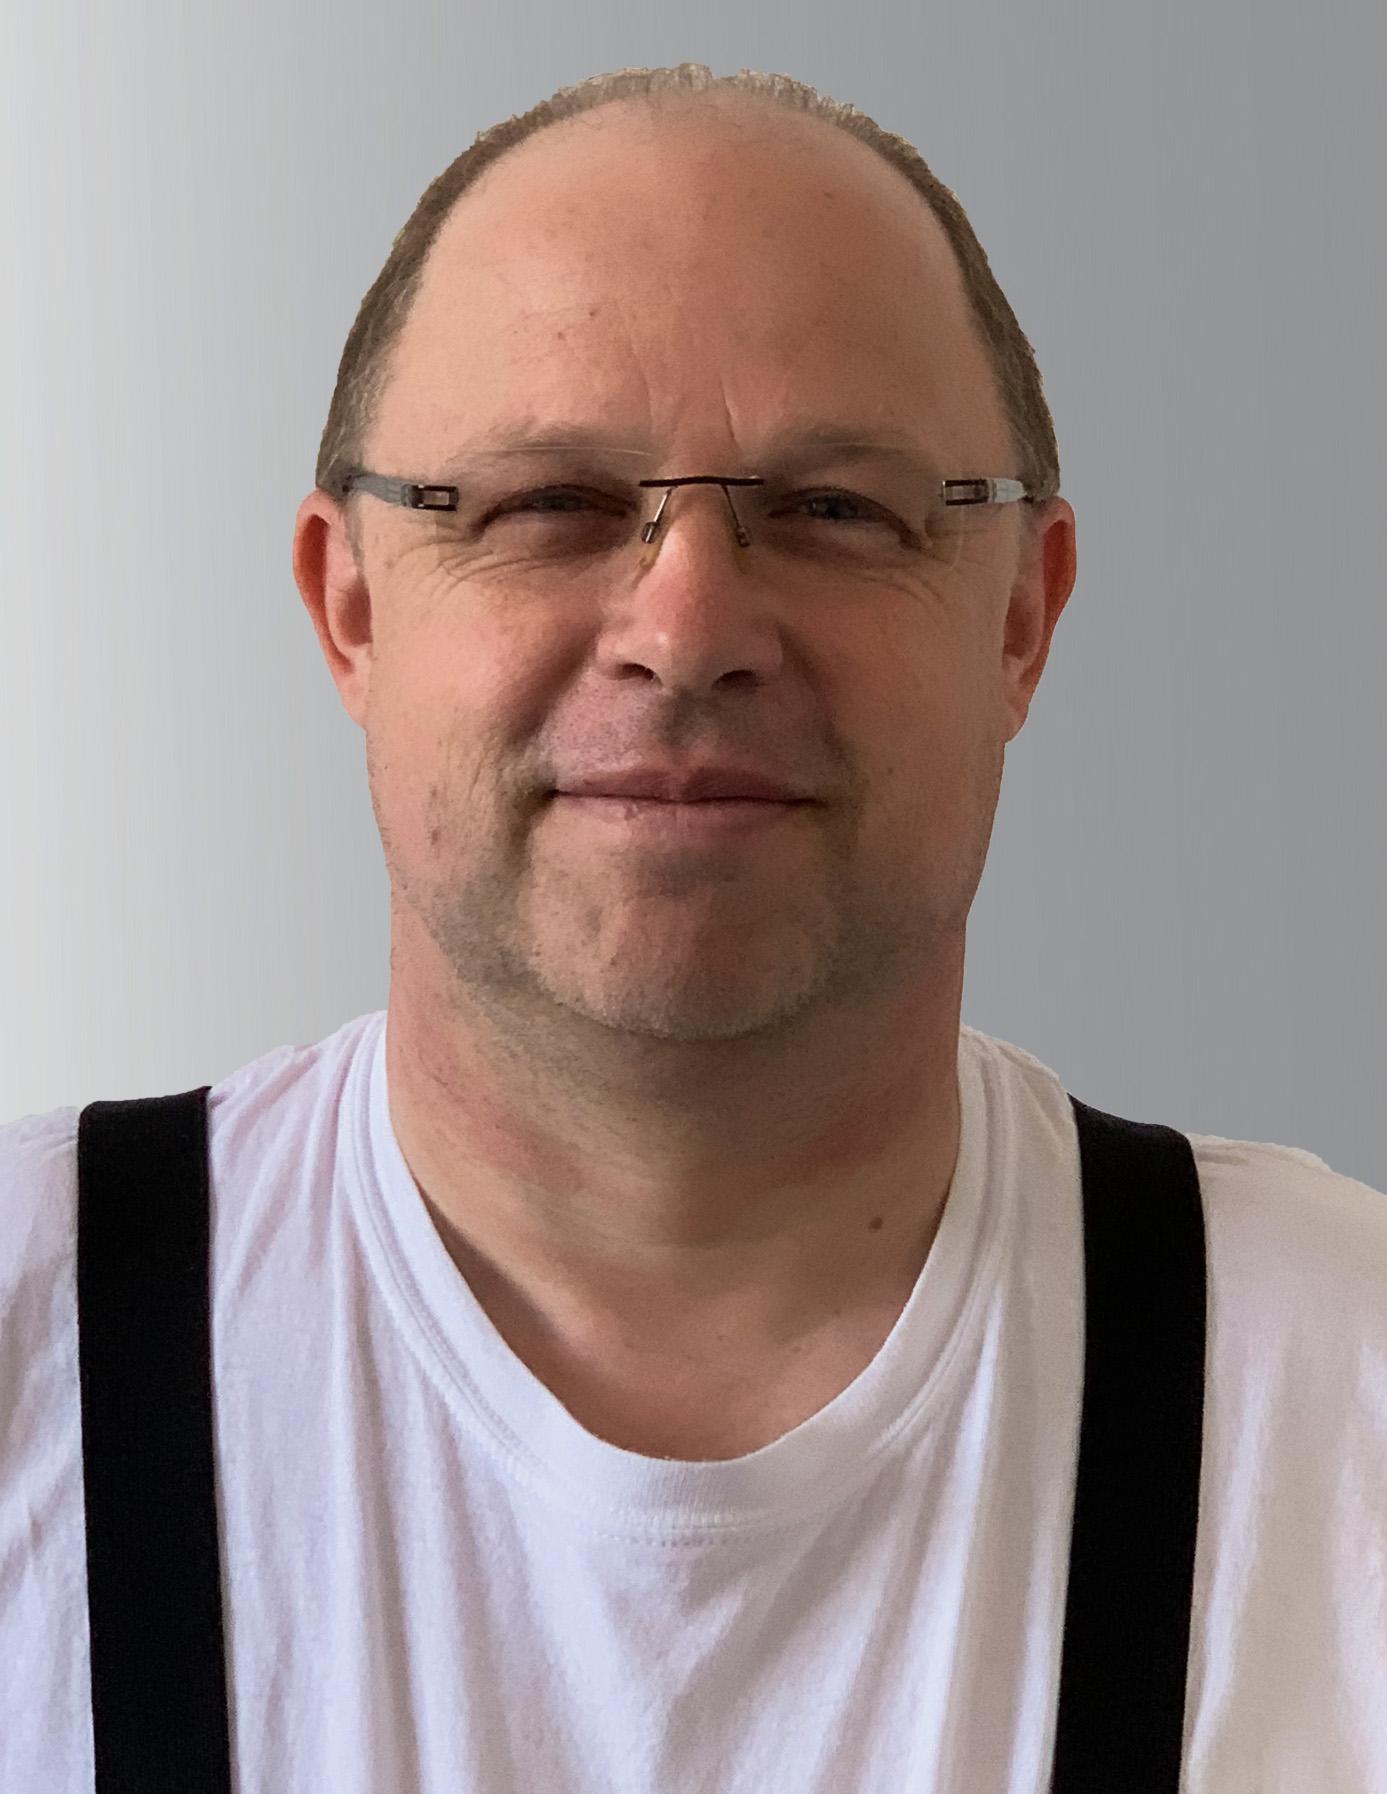 Herr Tietze